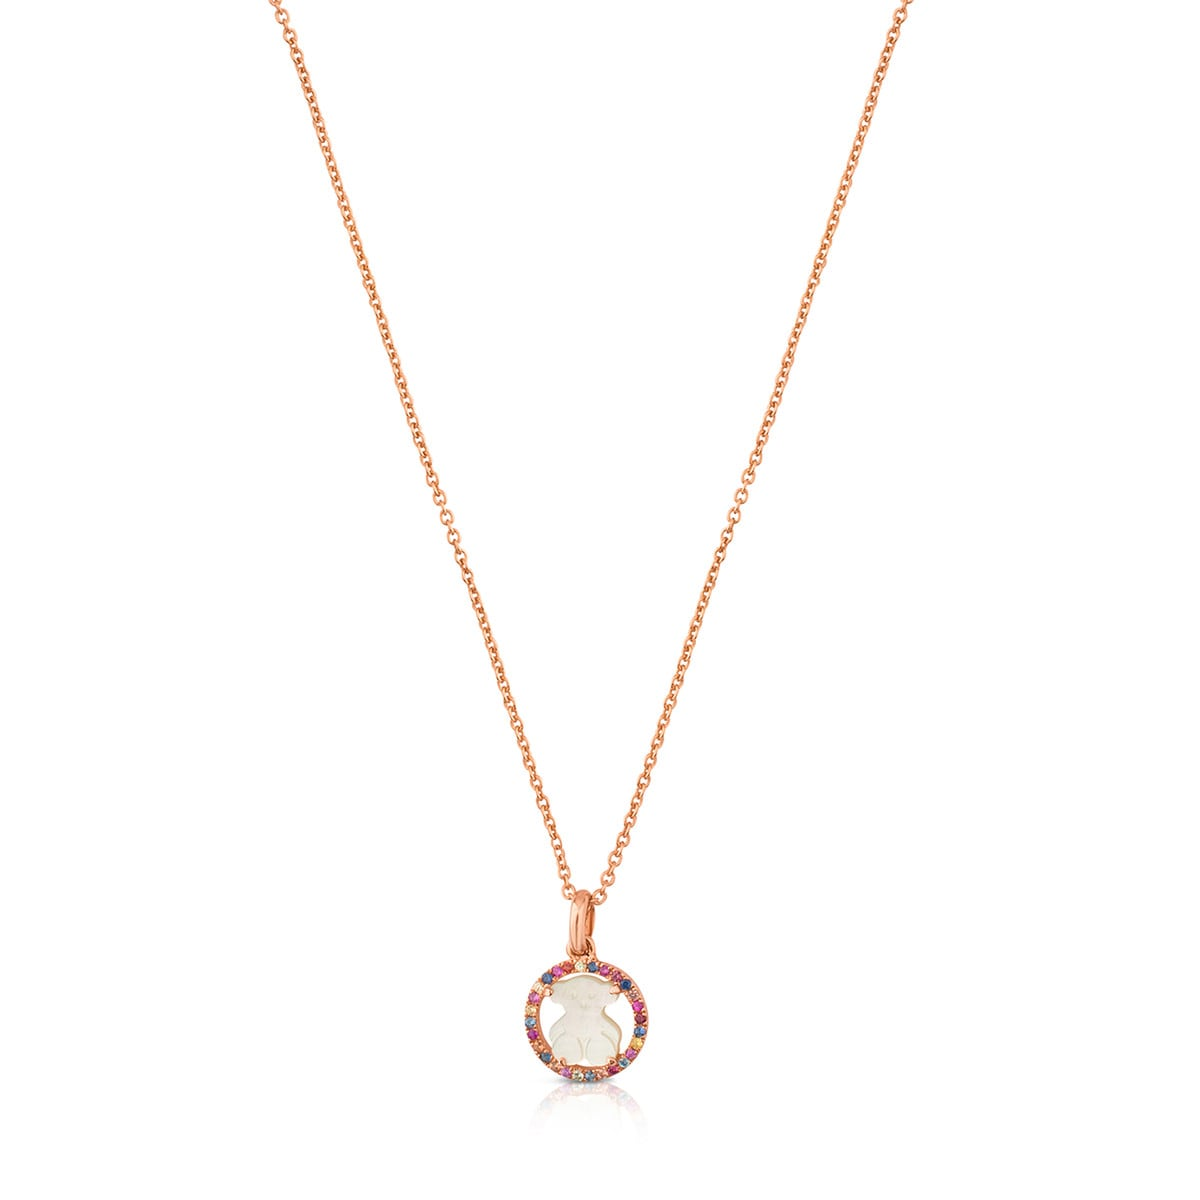 9741f3ec18e8 Collar Camille de Plata Vermeil rosa con Nácar y Zafiro multicolor ...